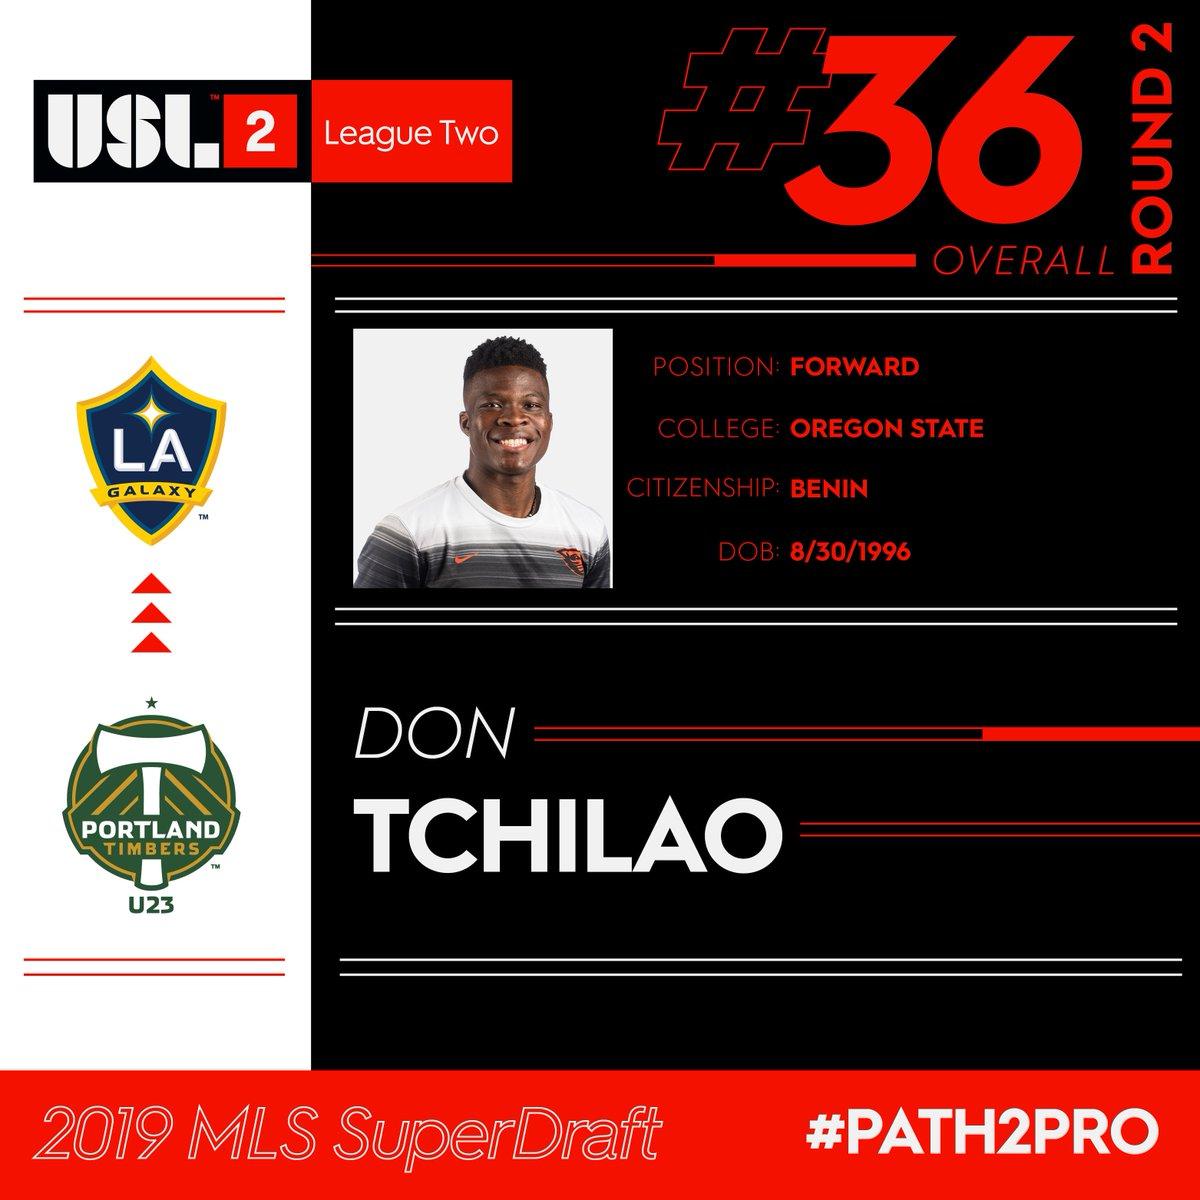 USL League Two's photo on Don Tchilao